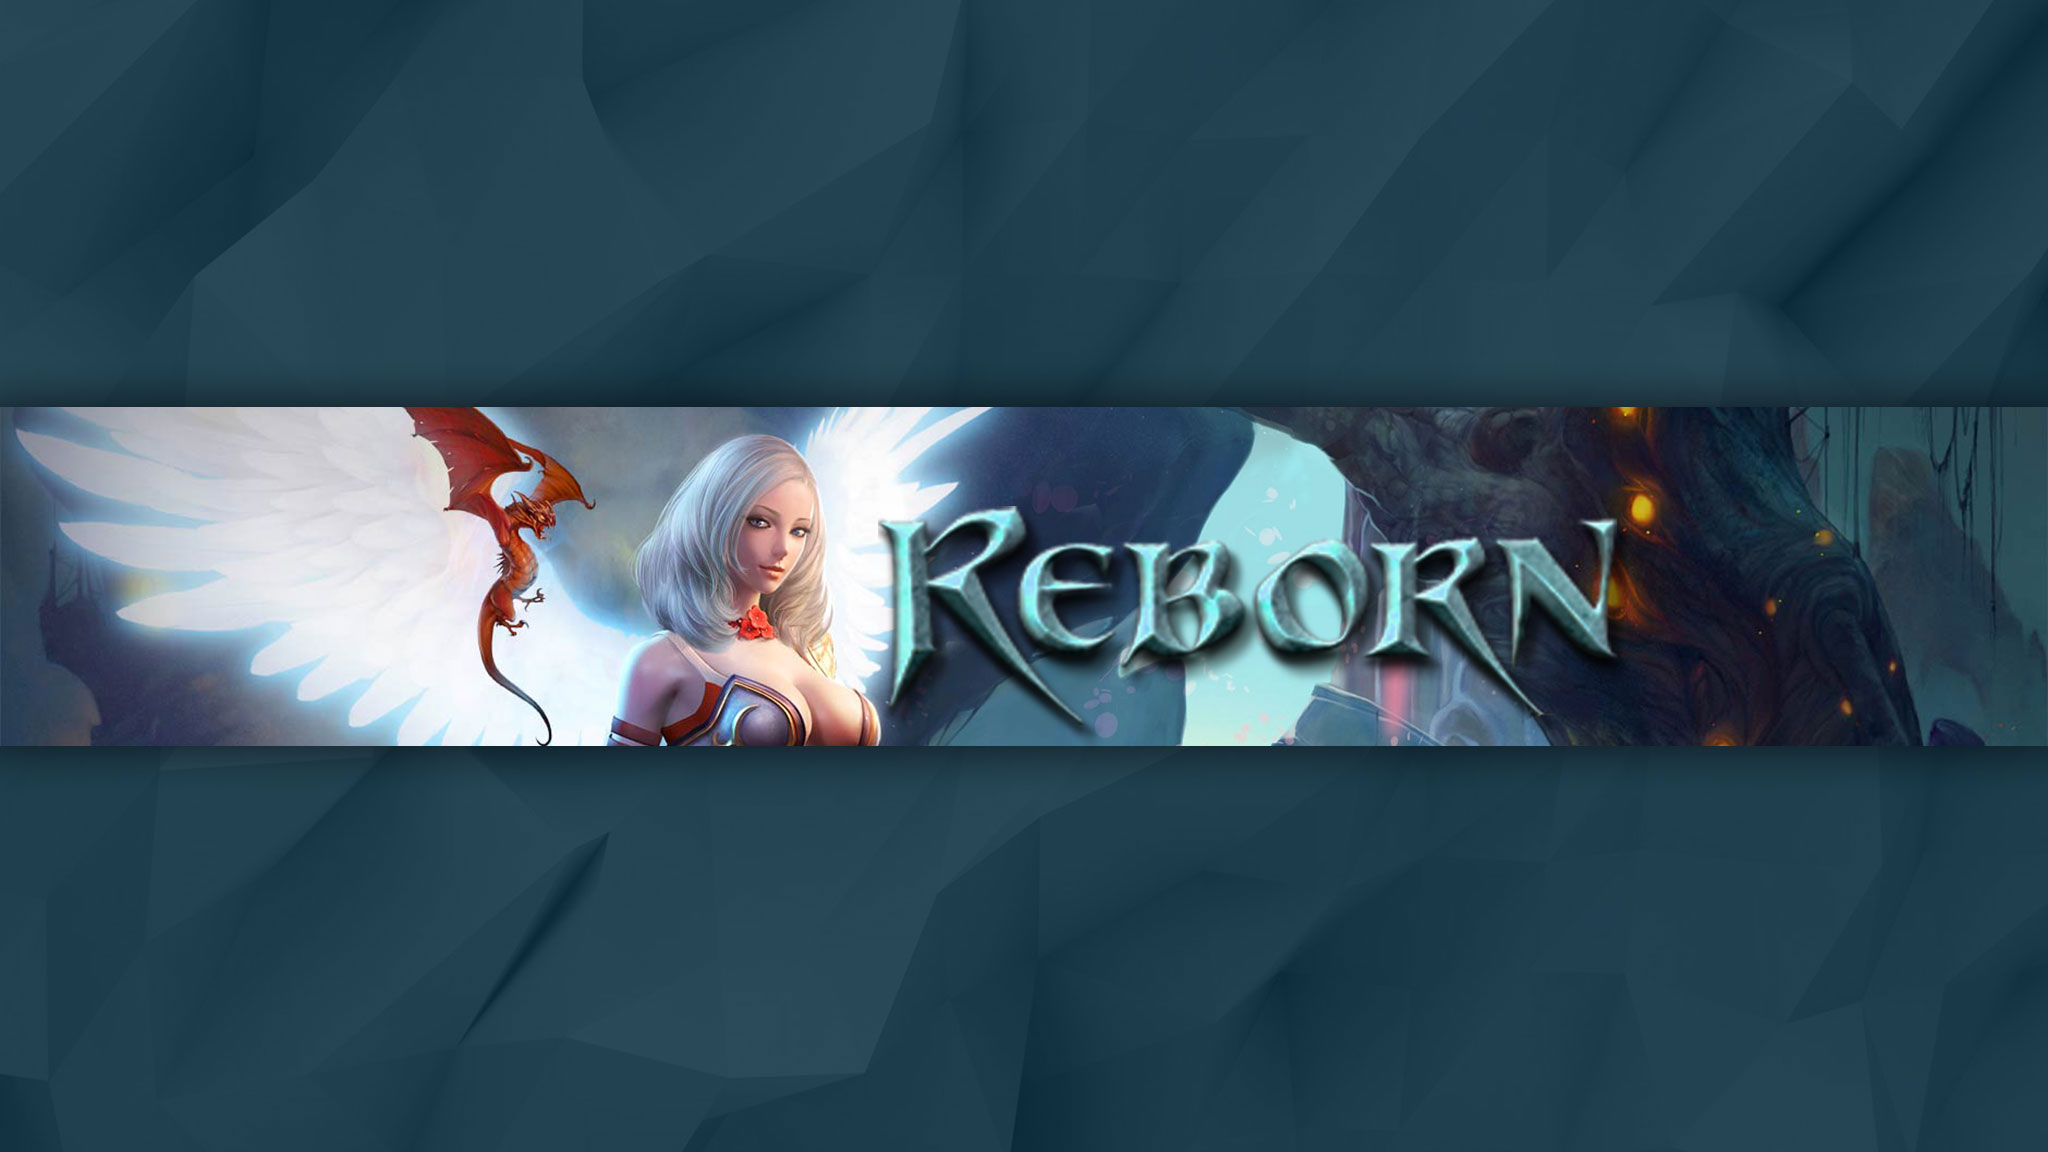 Картинка с текстом - шапка 2048x1152 для ютуба по MMORPG Reborn Online с аниме персонажем на синем фоне.